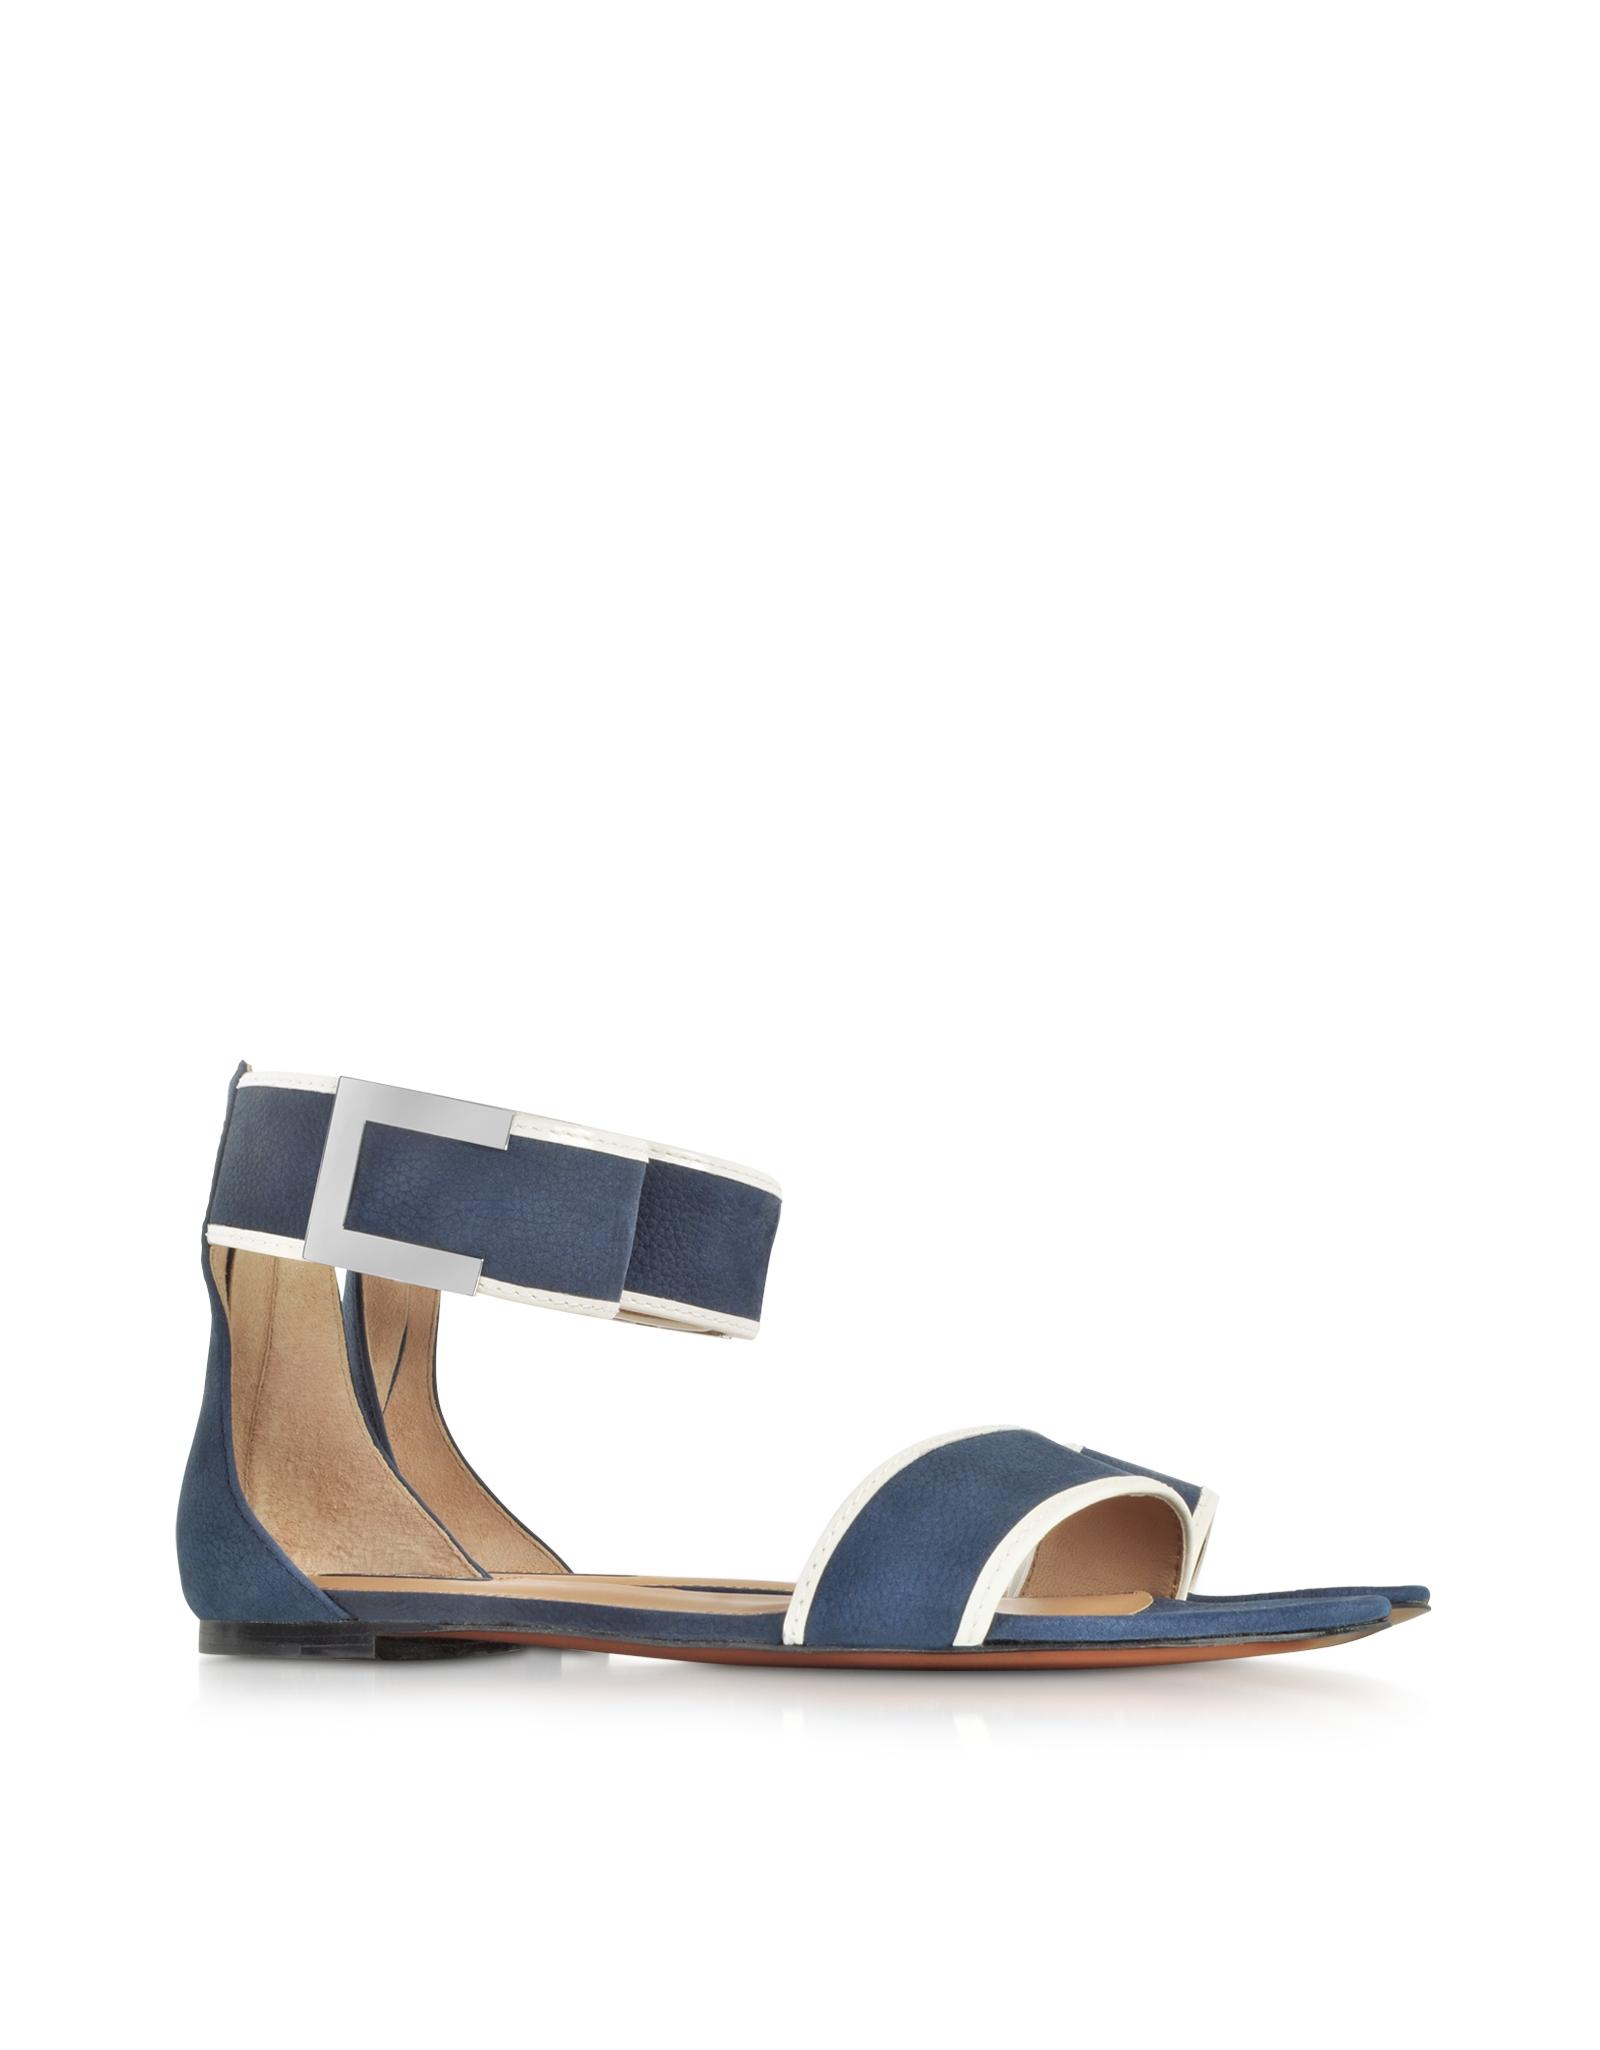 Rachel Zoe Gracie Navy Blue And White Flat Sandal In Blue